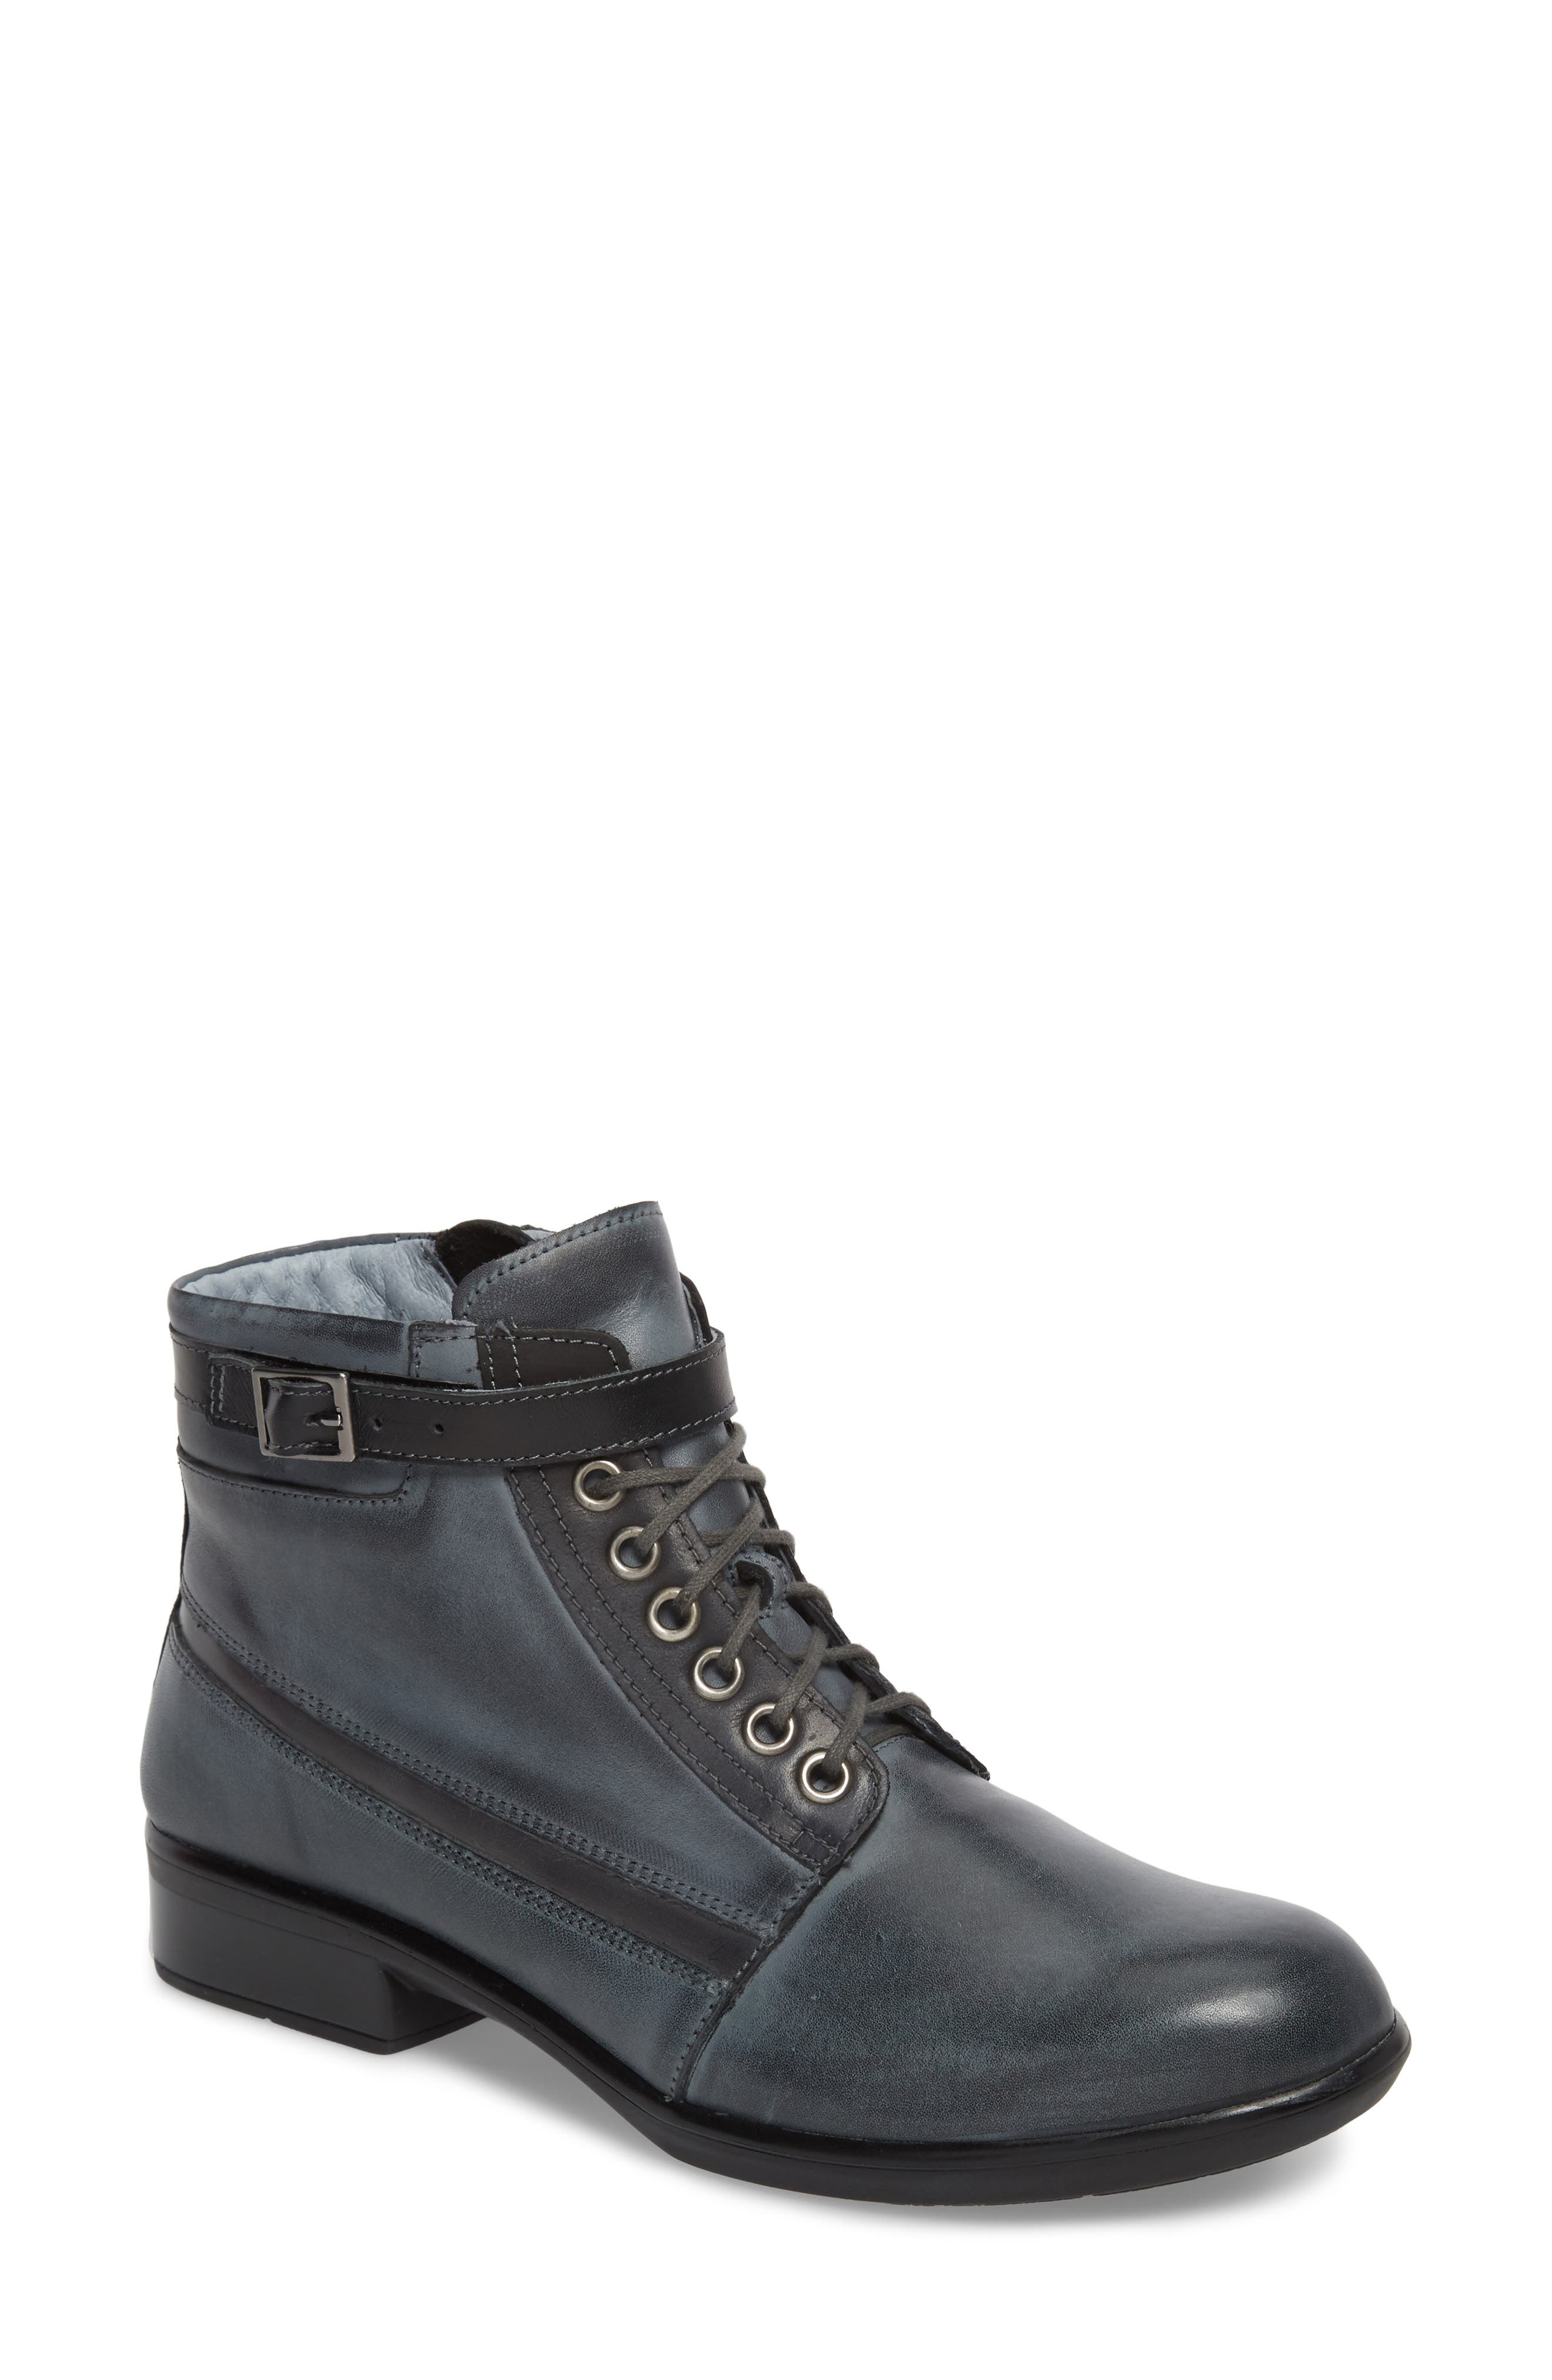 Alternate Image 1 Selected - Naot Kona Boot (Women)